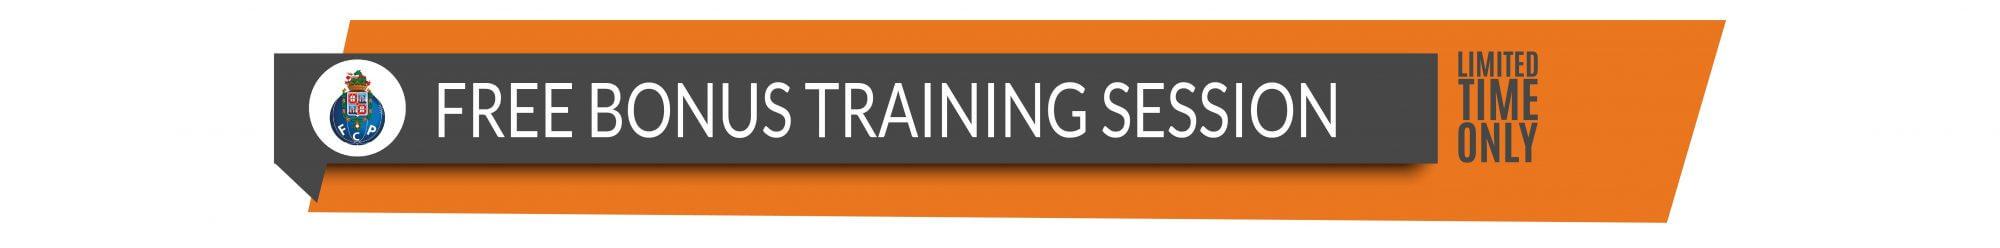 Porto Offer - FREE Bonus Training Session